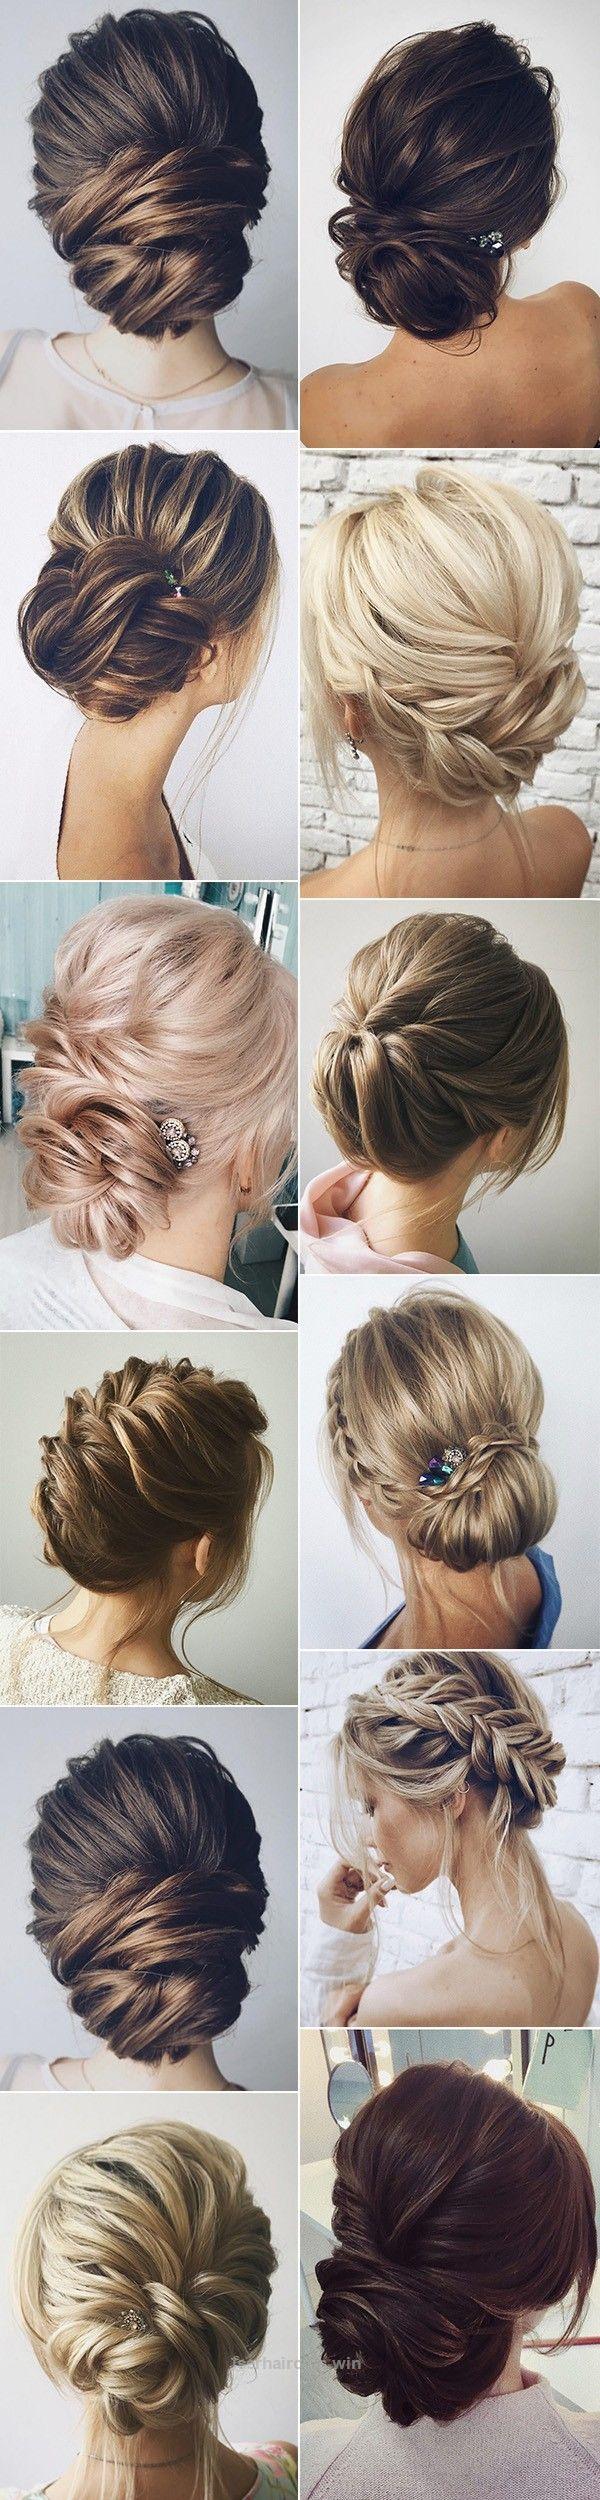 Splendid elegant bridal updos wedding hairstyles The post elegant bridal updos wedding hairstyles… appeared first on Iser Haircuts .